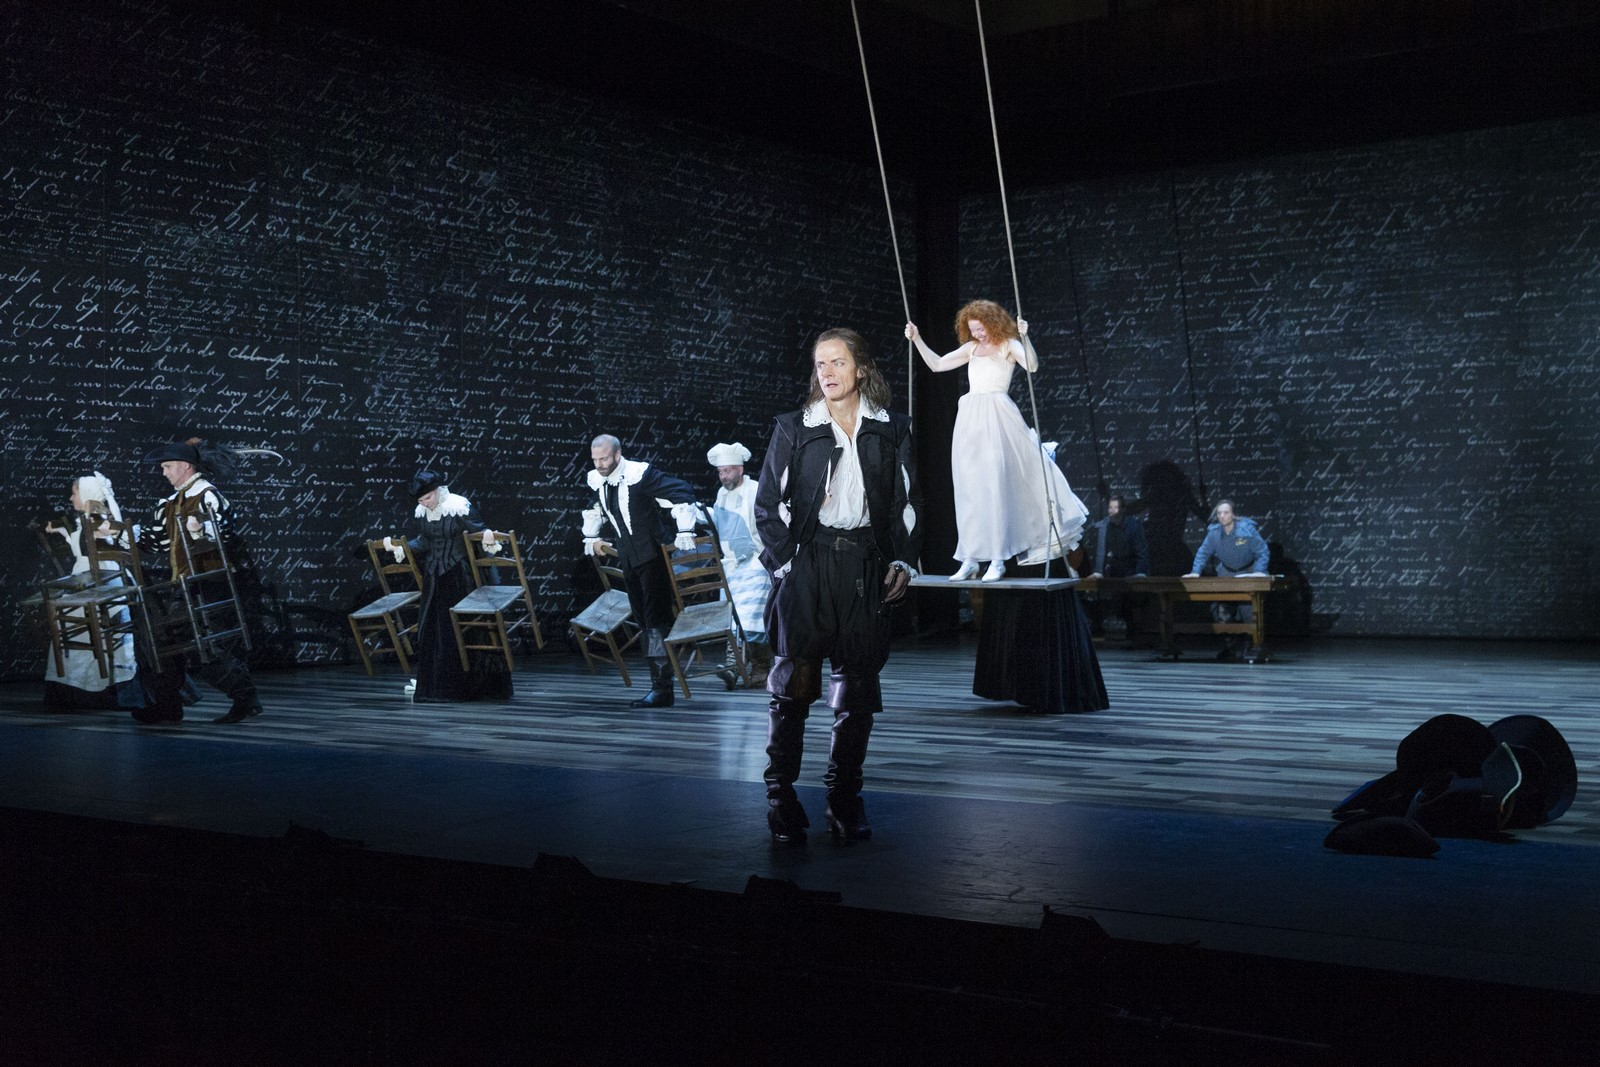 Anmeldelse: Cyrano de Bergerac, Det Kongelige Teater